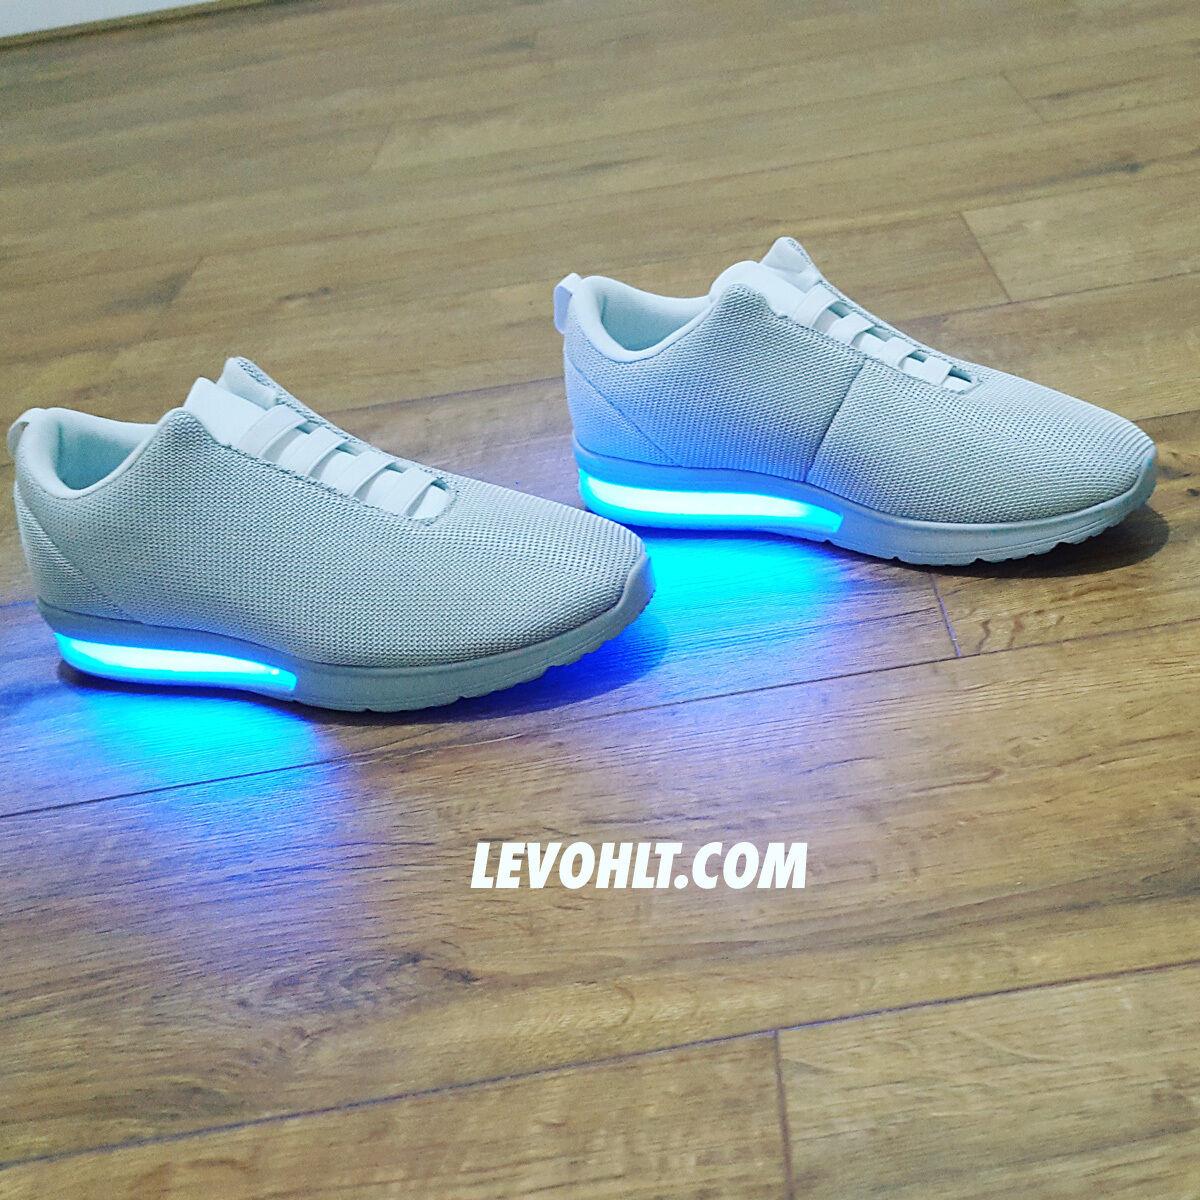 Levohlt Lowtop LED Sneaker - Back To